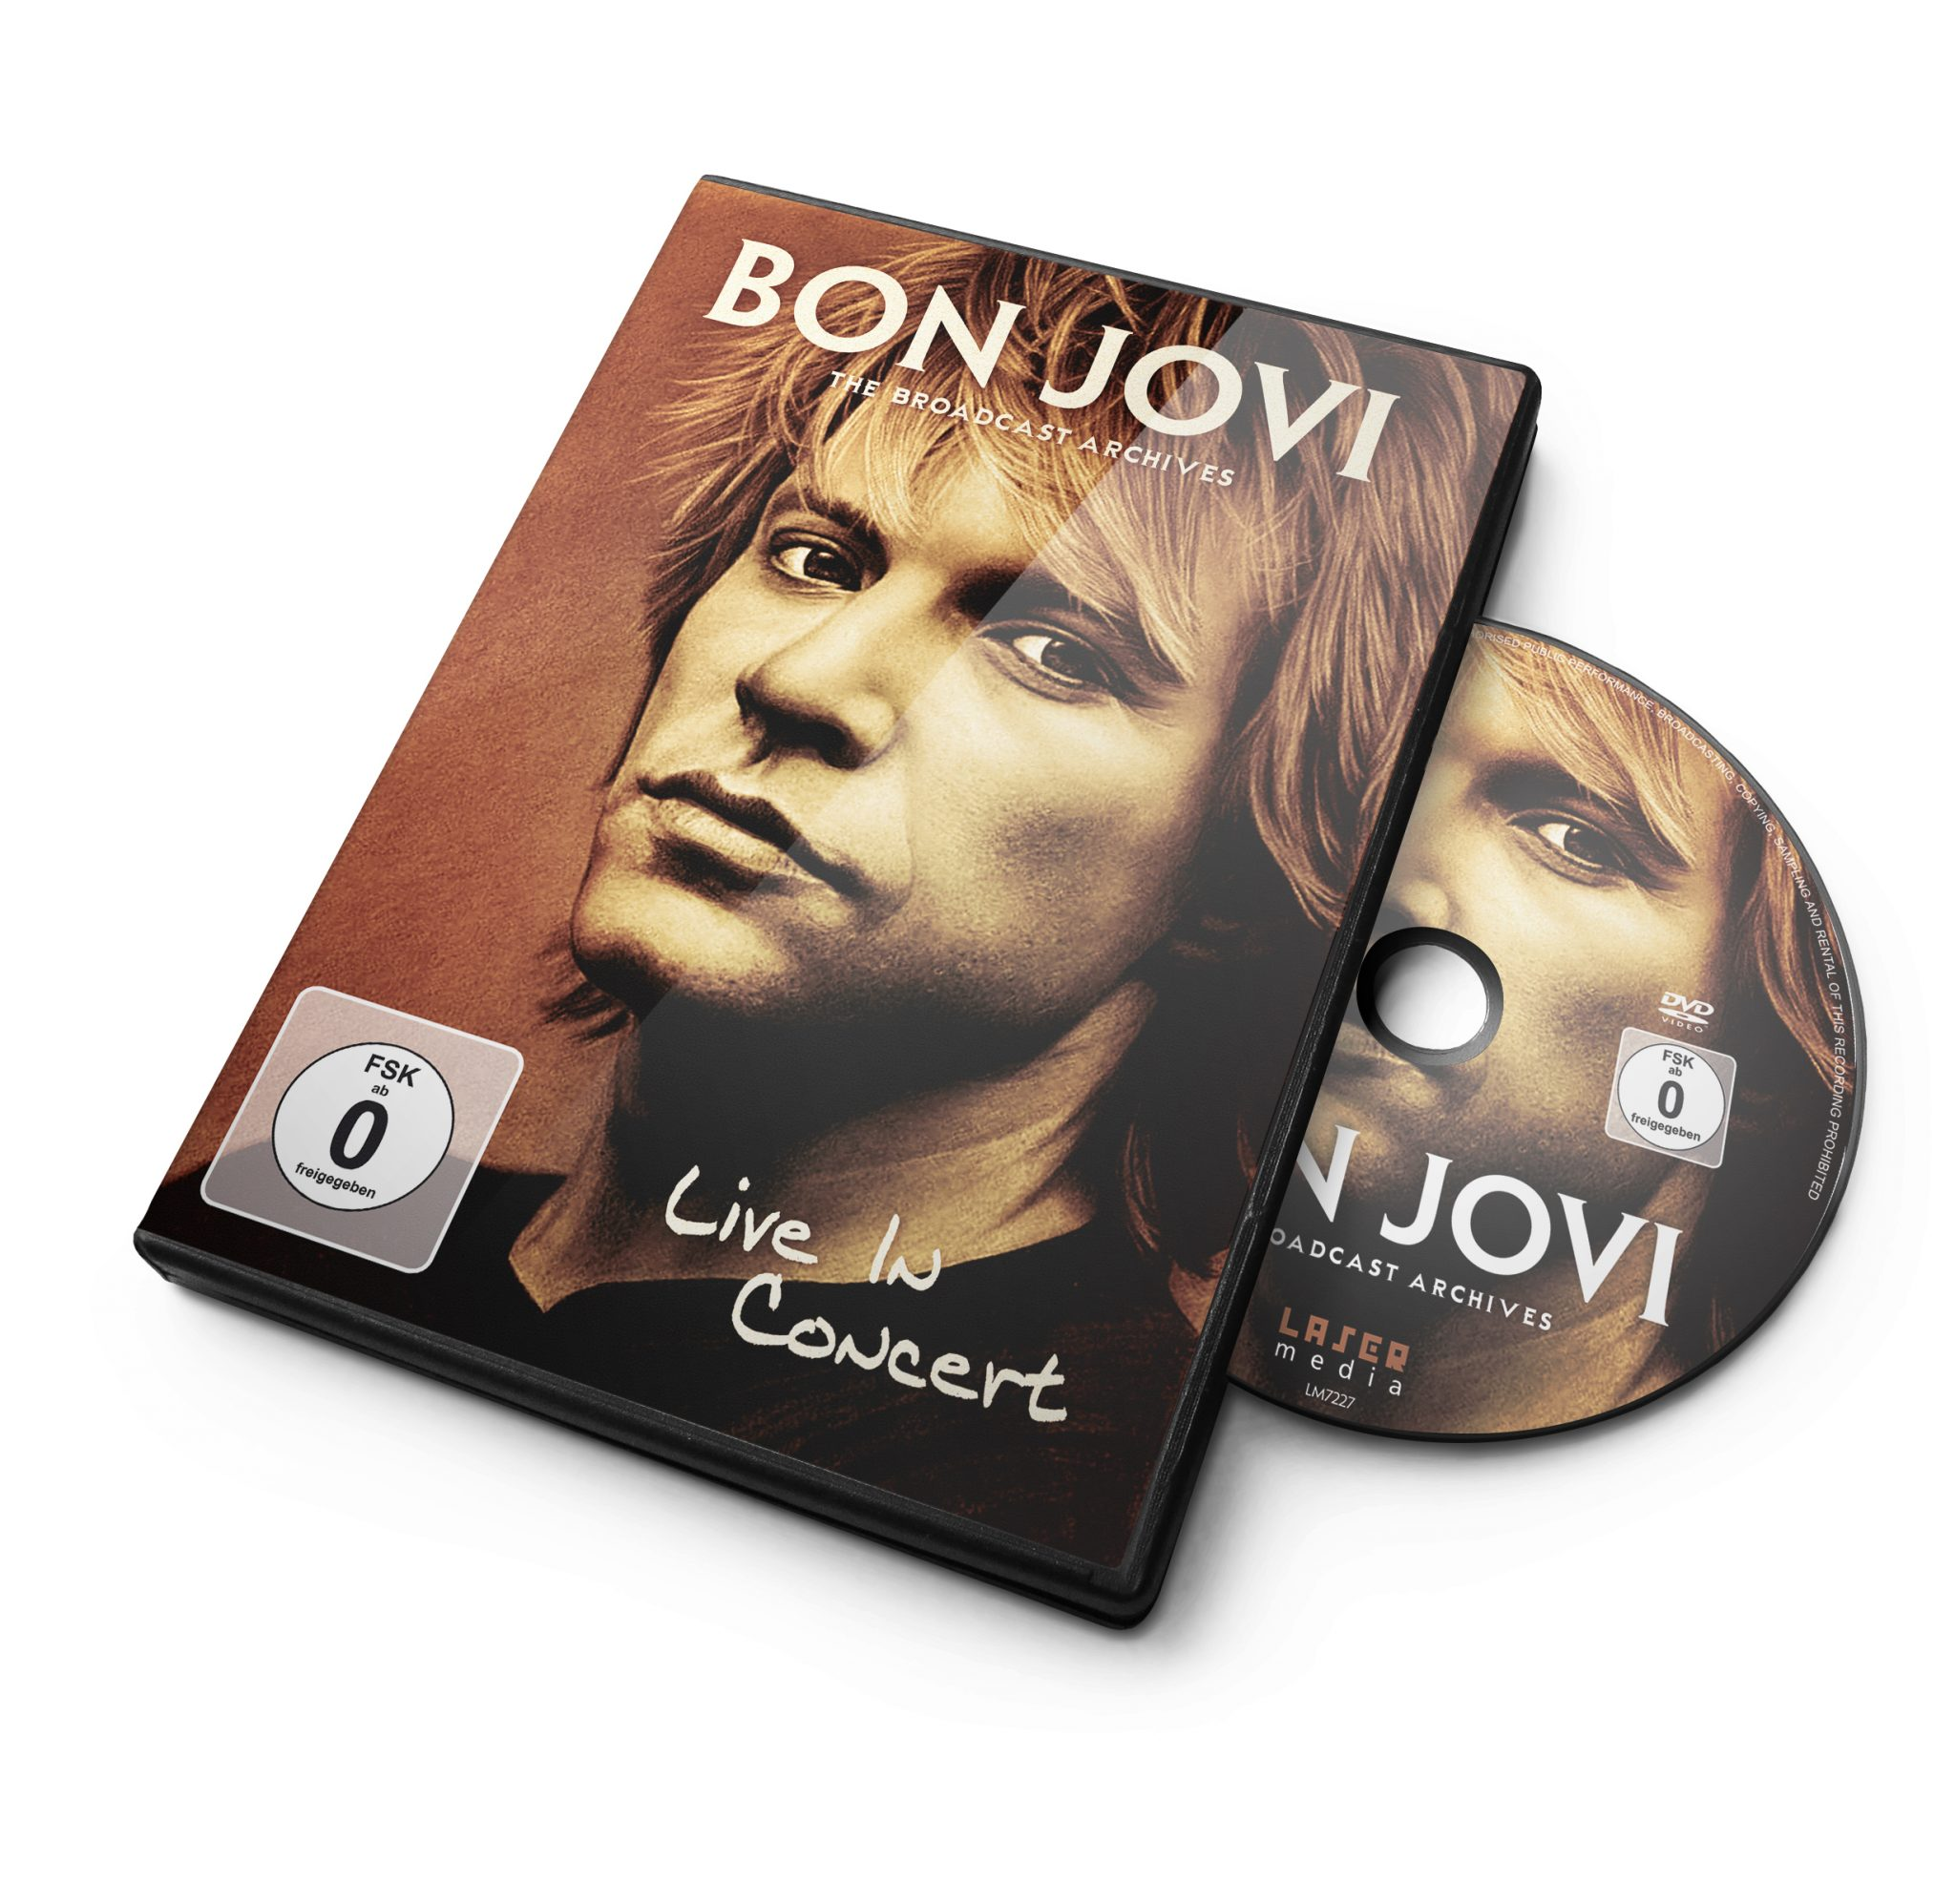 bon jovi_dvd